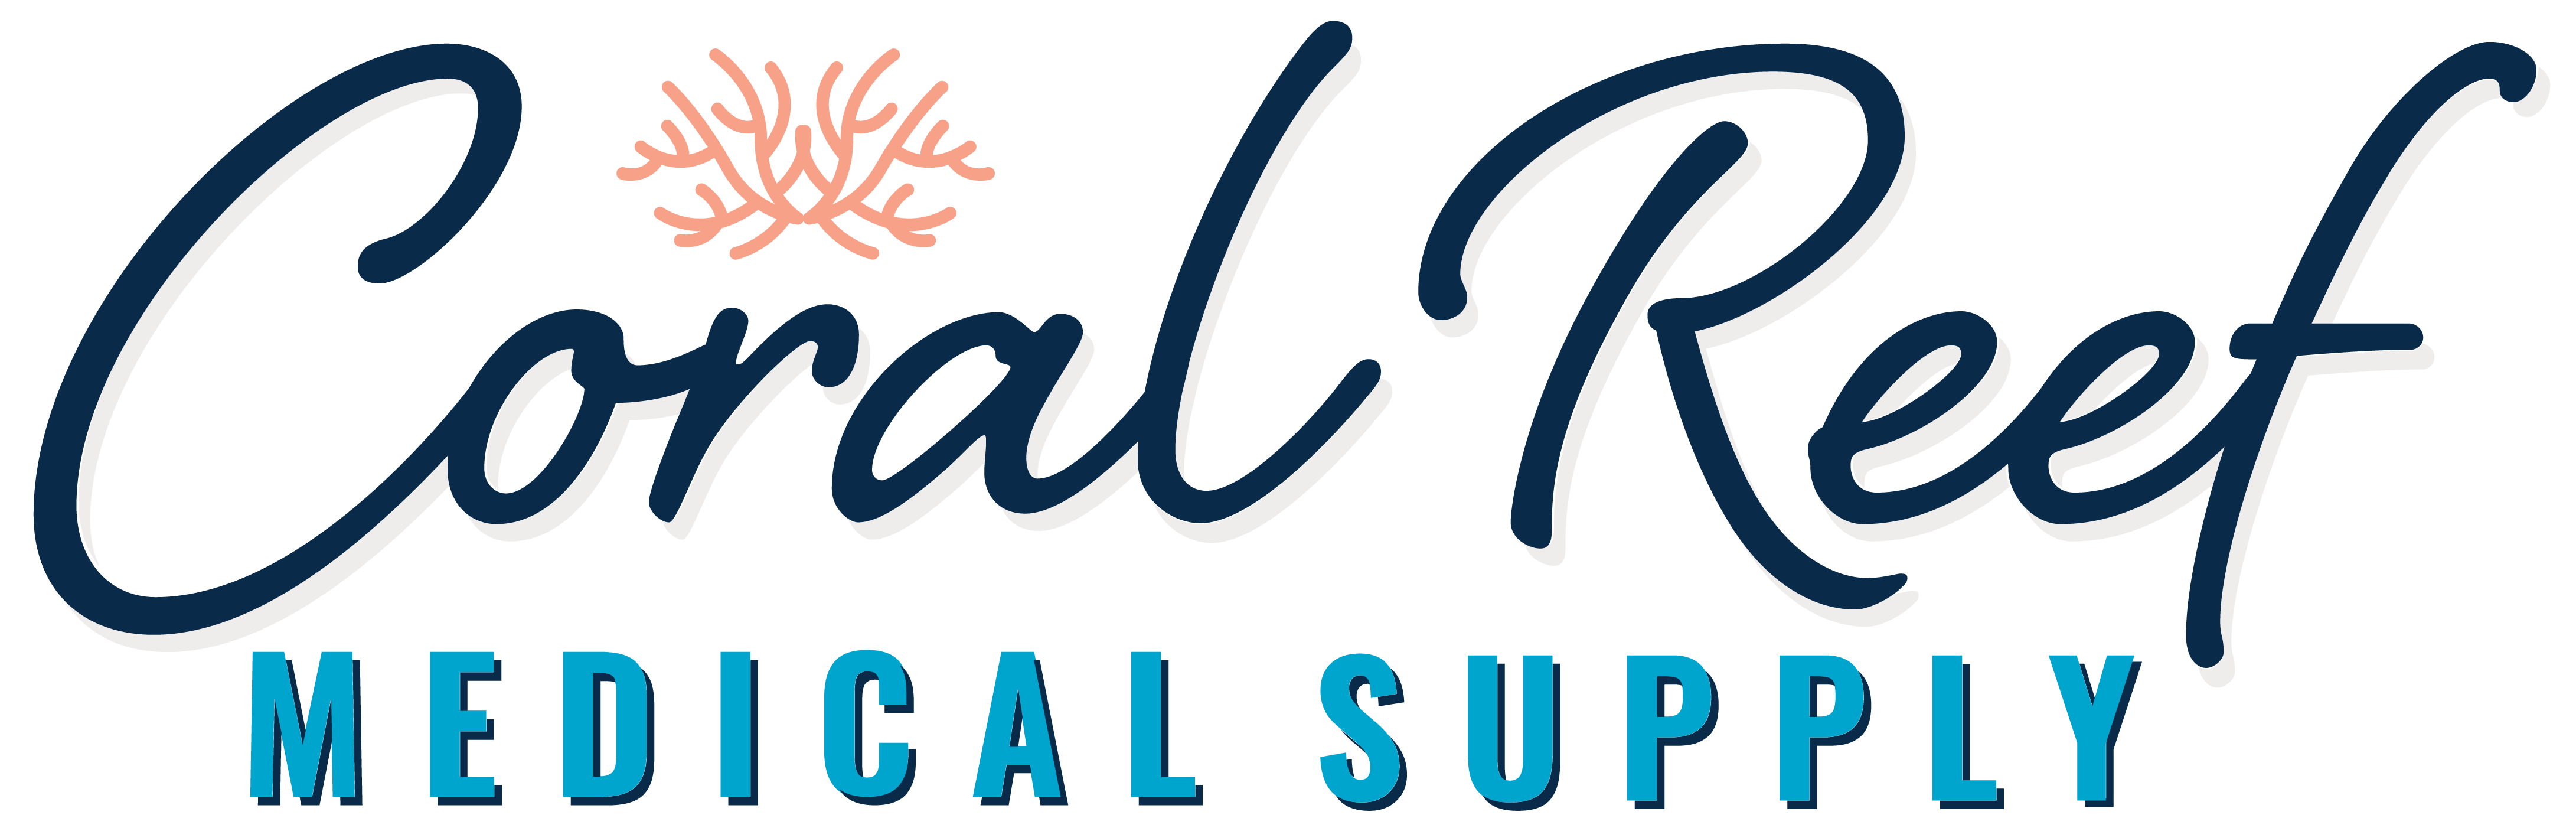 Coral Reef Medical Supply